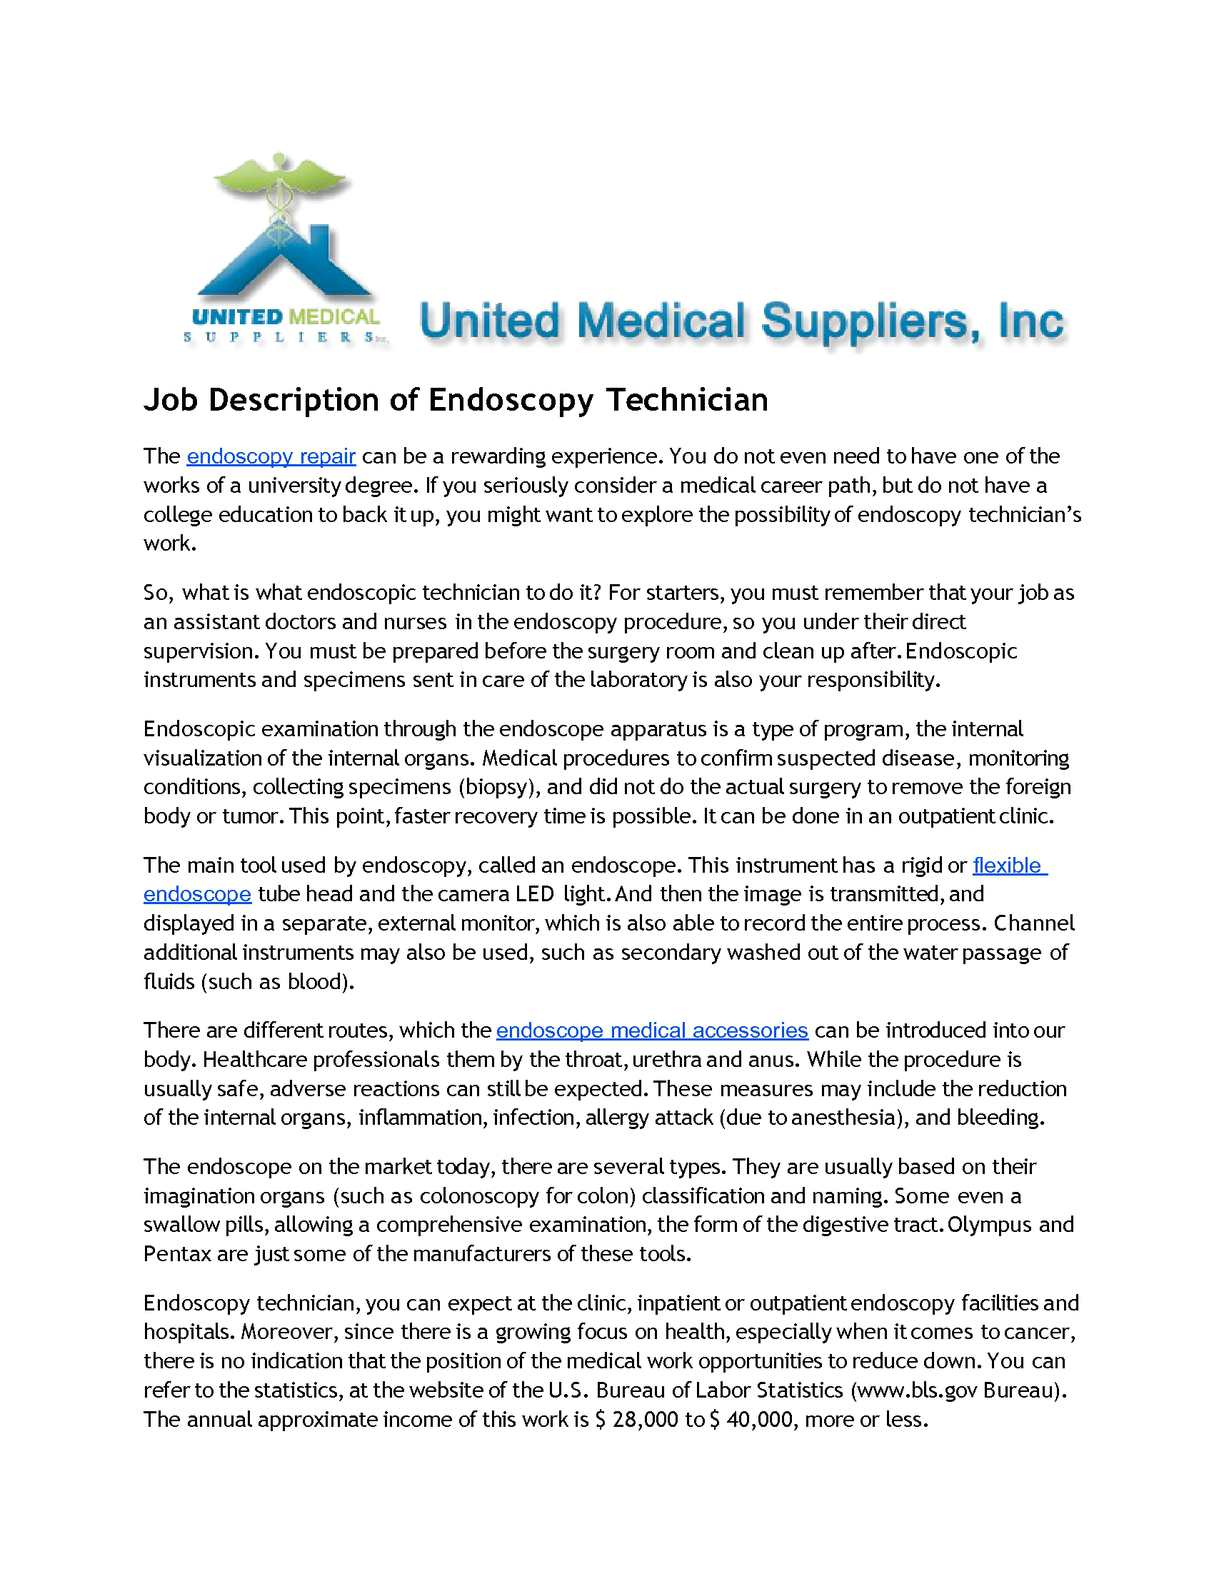 Endoscopy Cleaning Room: Job Description Of Endoscopy Technician